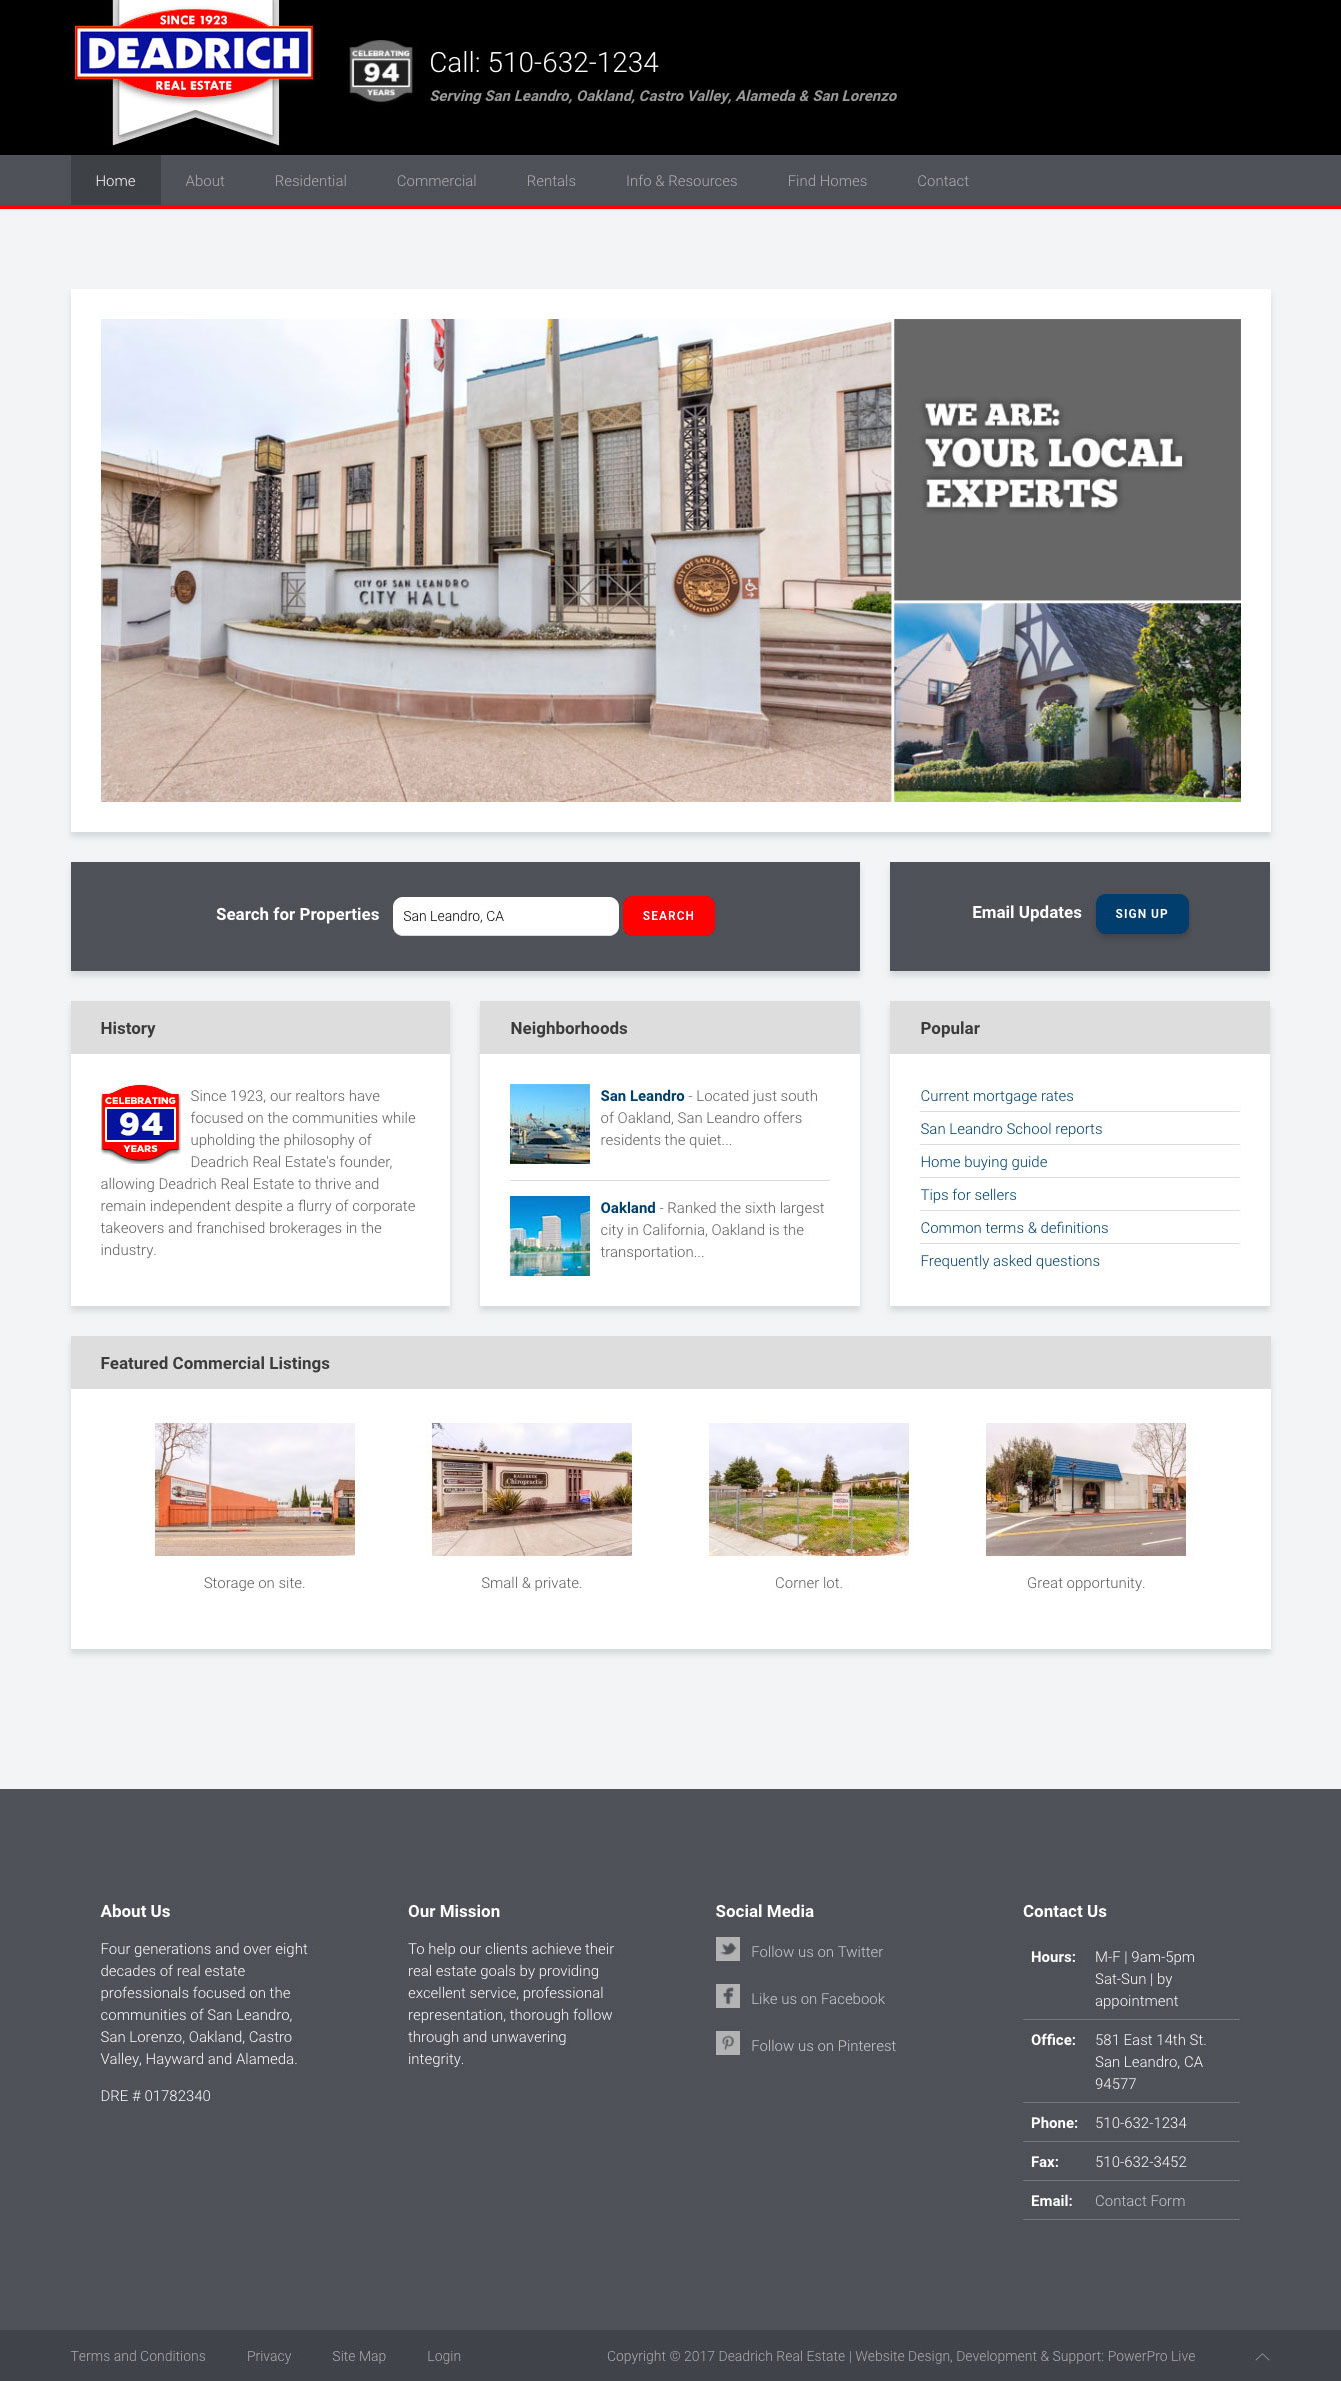 deadrich-real-estate-website